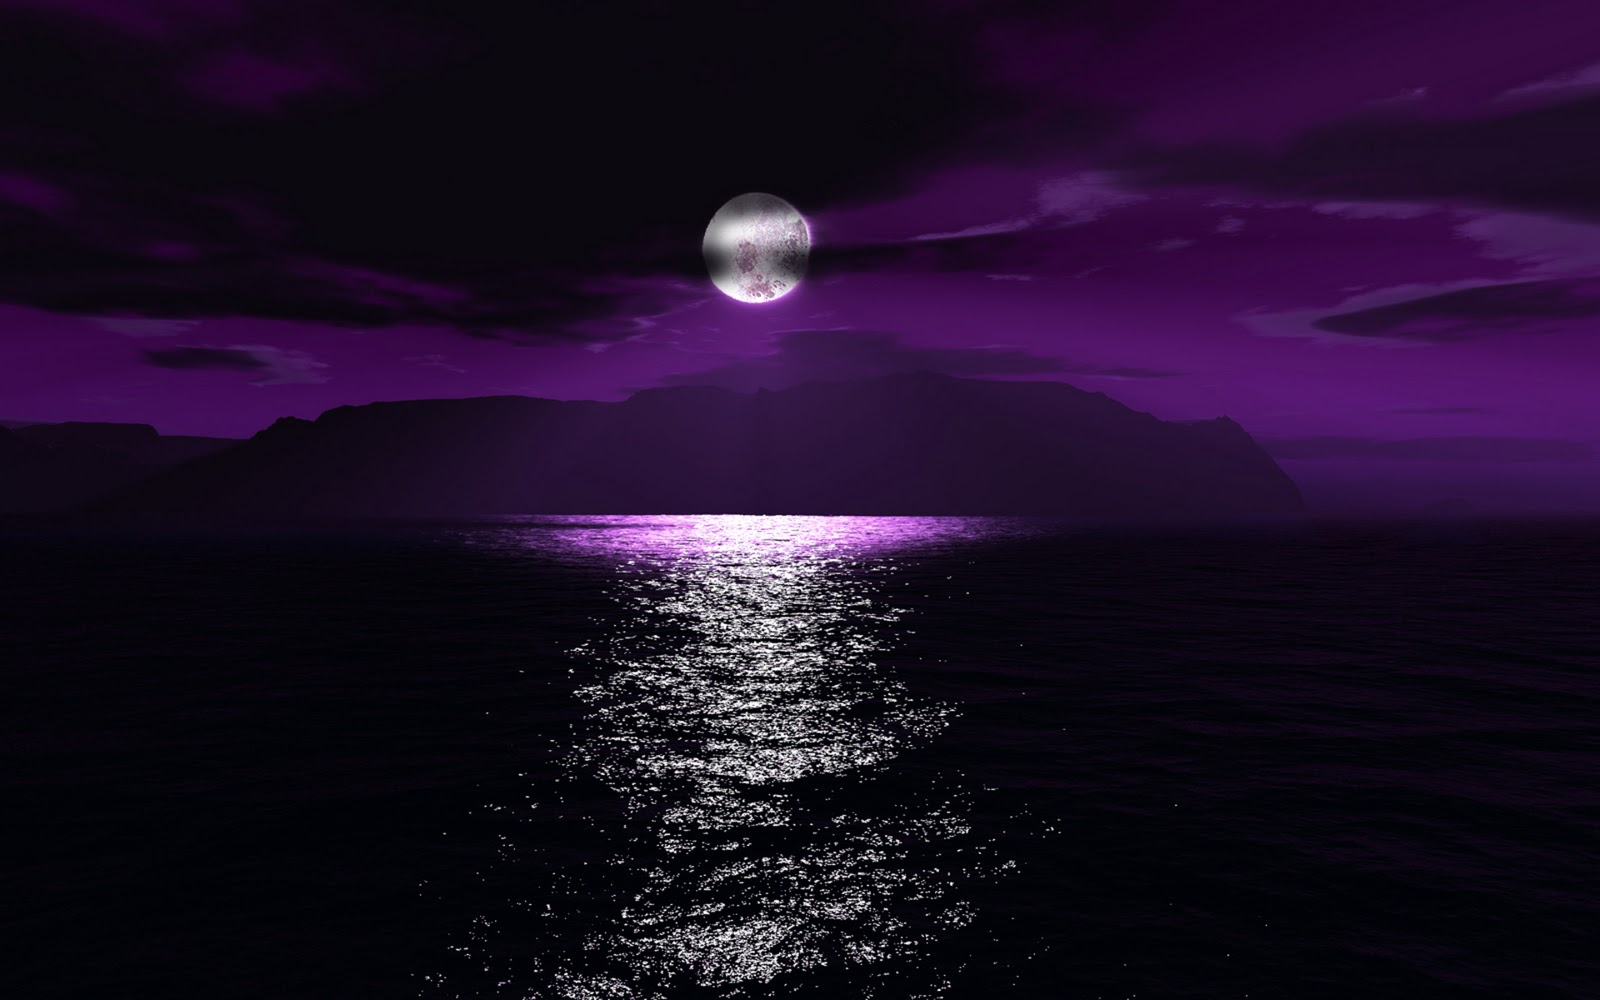 Sun Setting Over Moonlight Night Moon Images 1600x1000